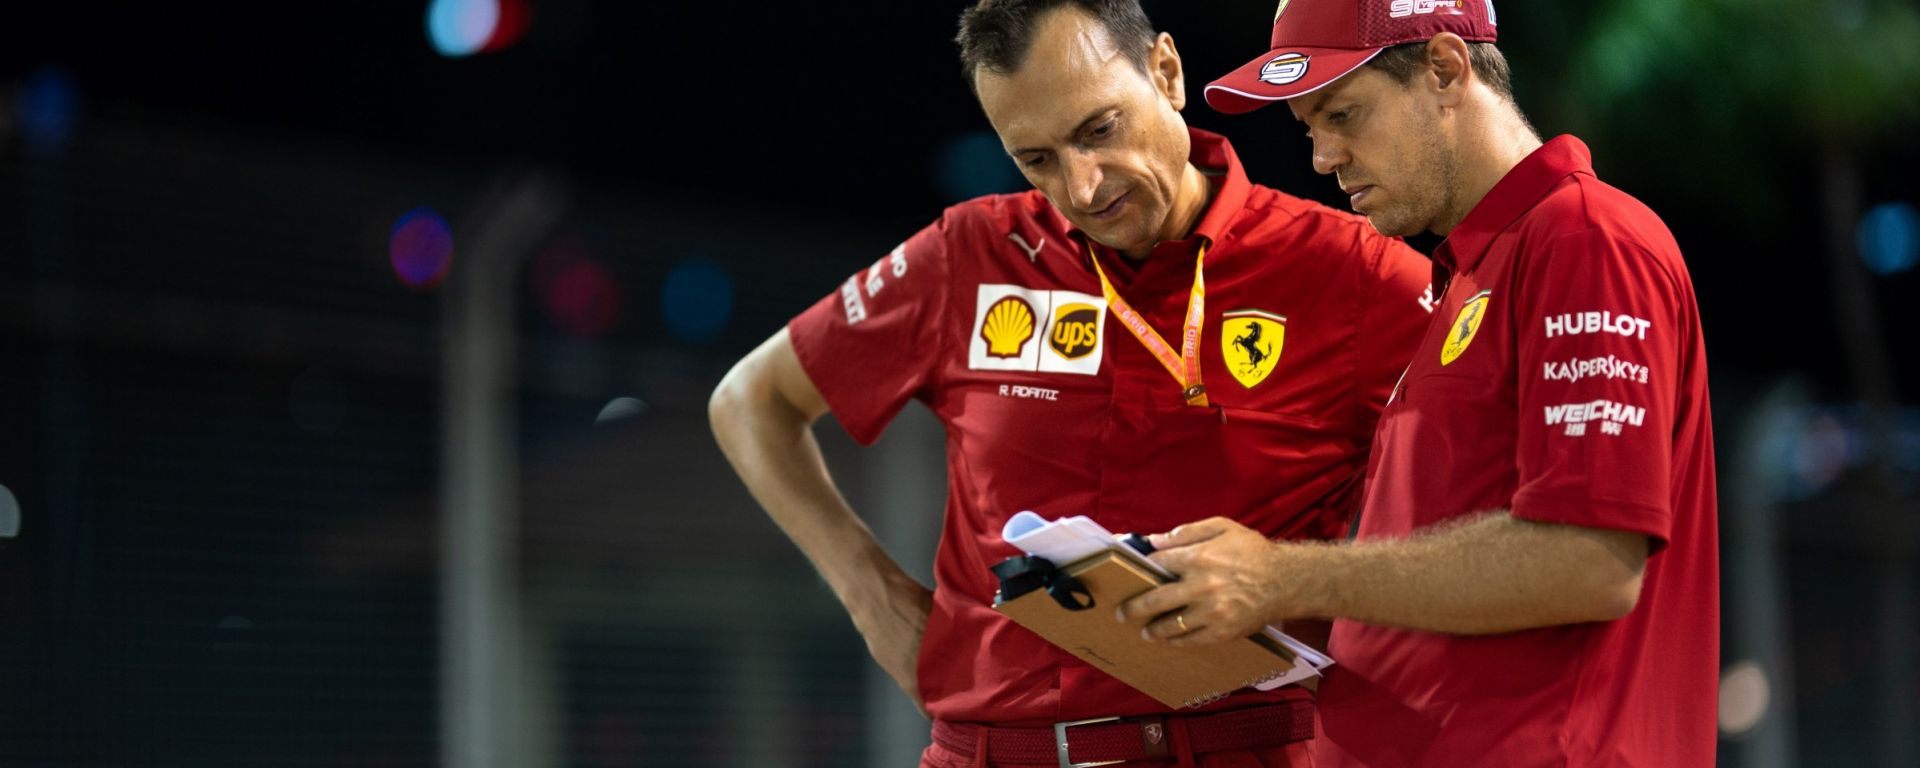 F1, GP Singapore 2019: Sebastian Vettel prende appunti